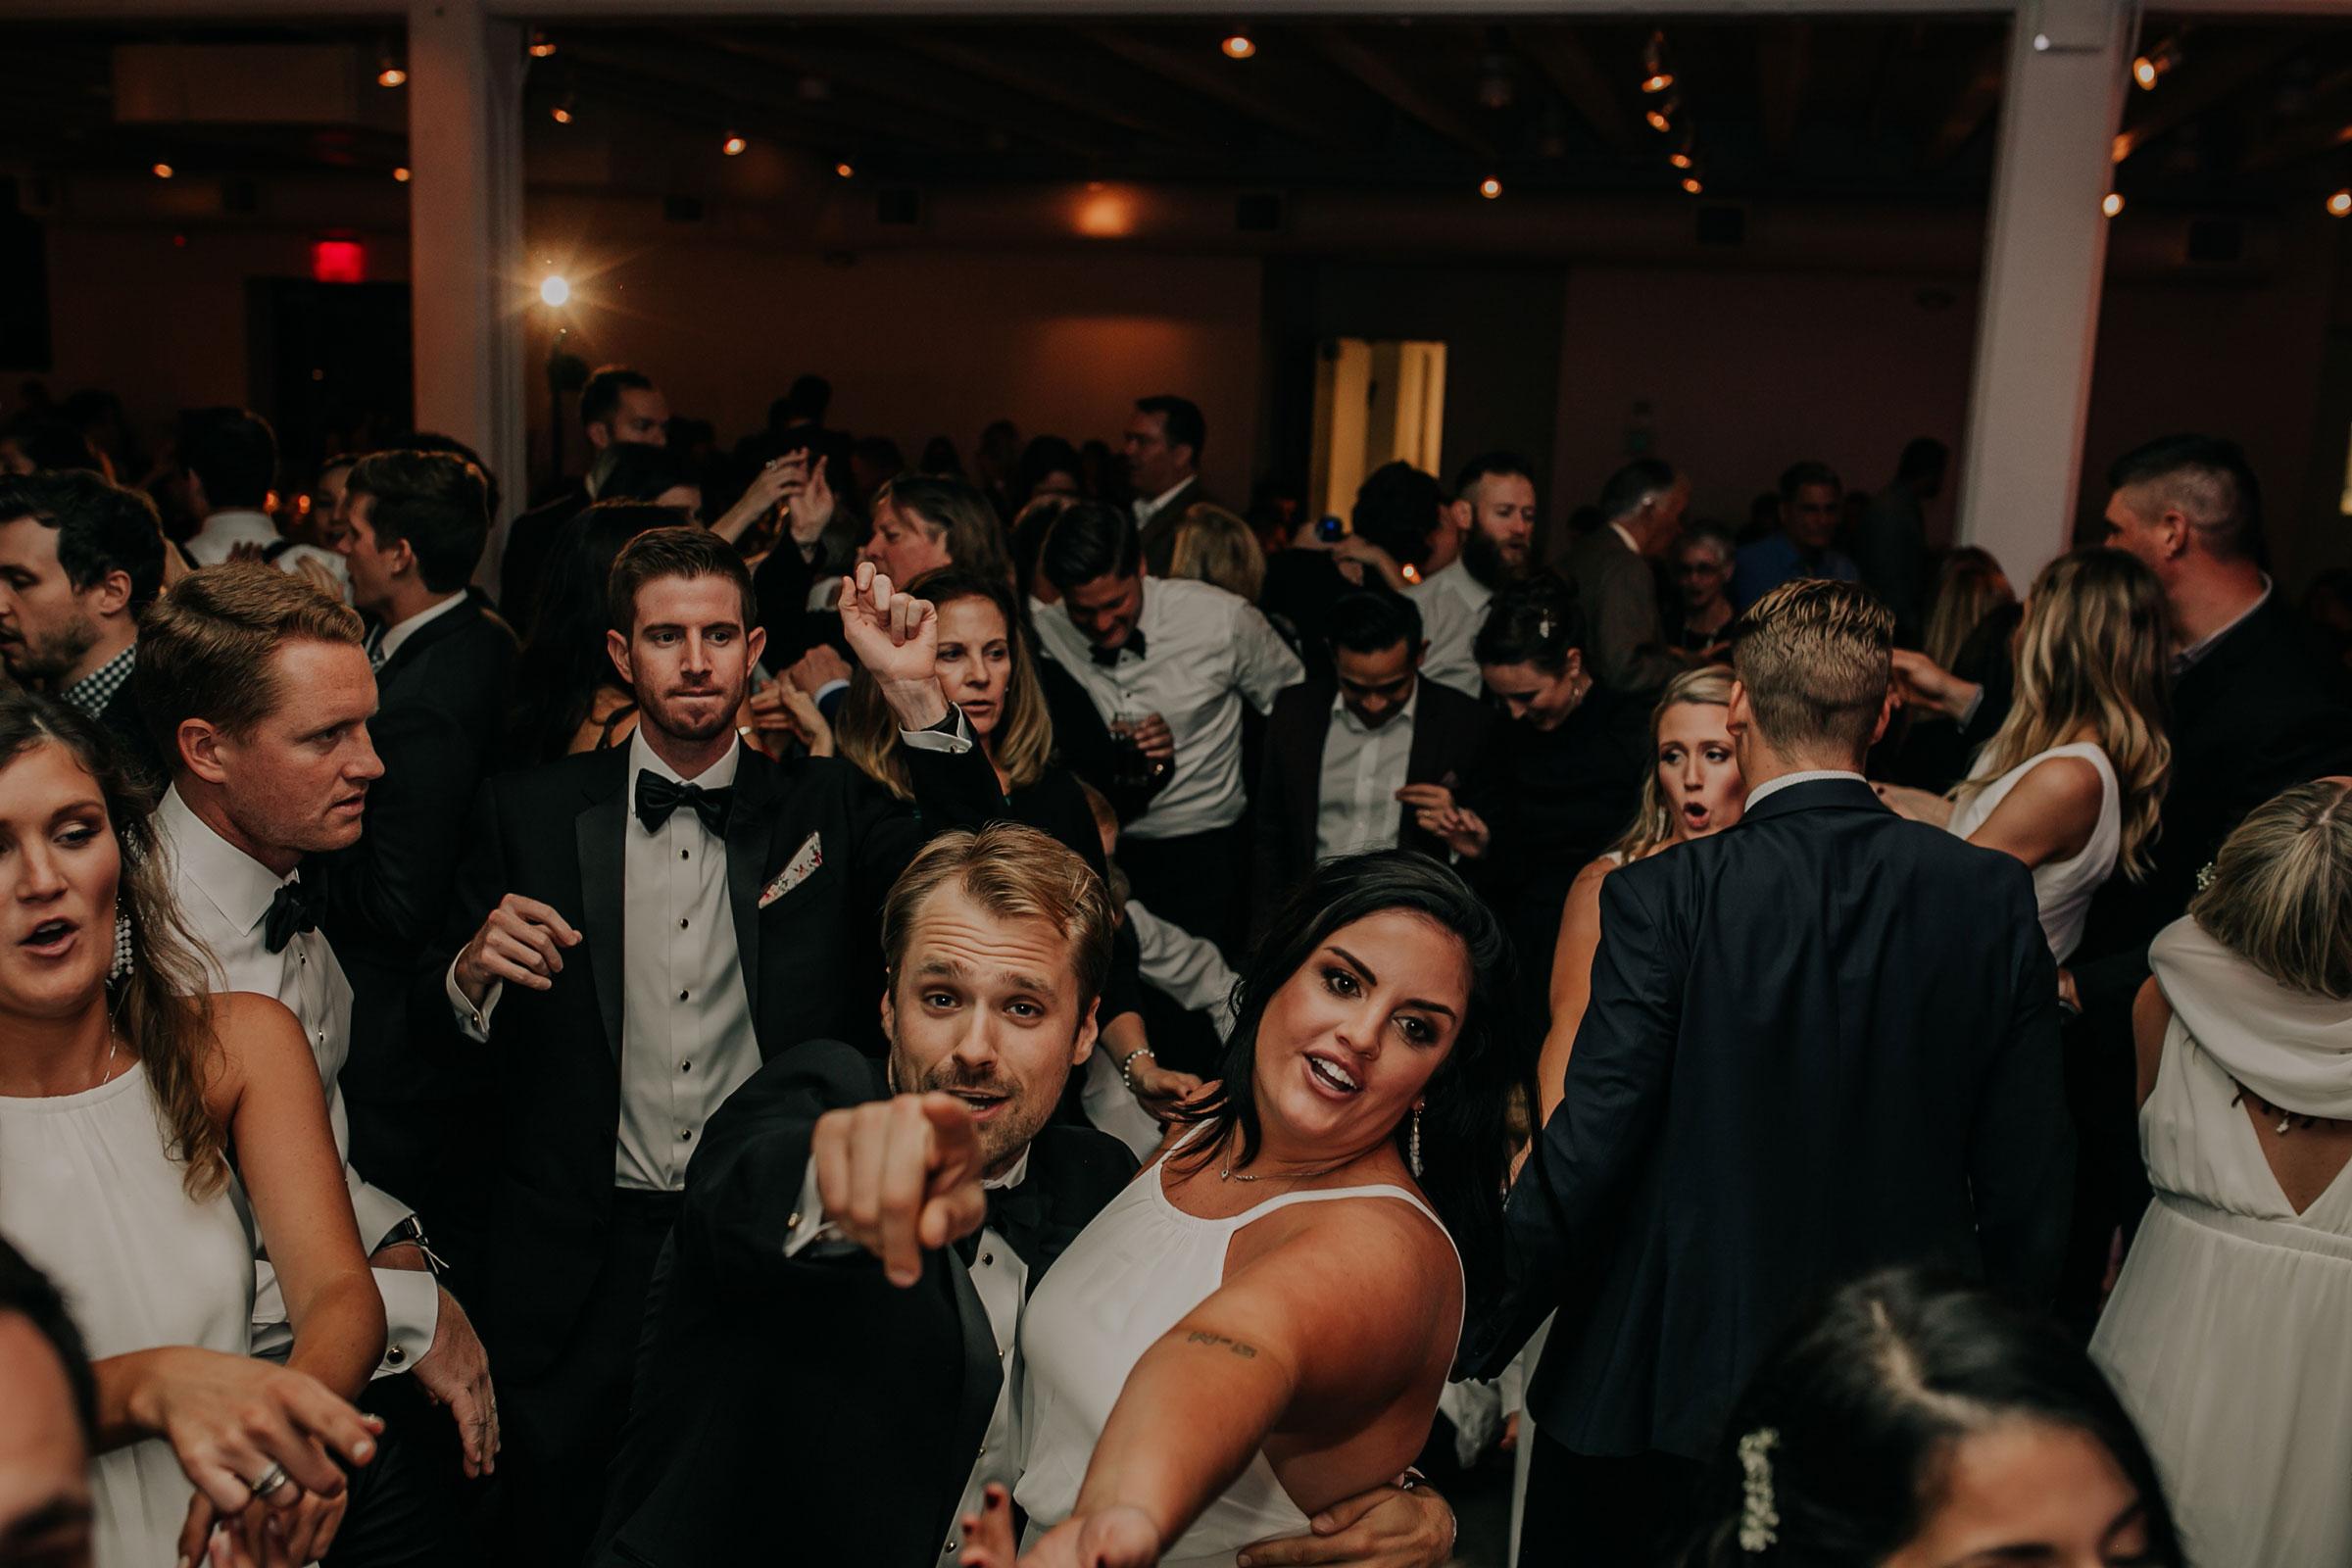 groomsmen-pointing-at-camera-while-dancing-founders-one-nine-omaha-nebraska-raelyn-ramey-photography.jpg